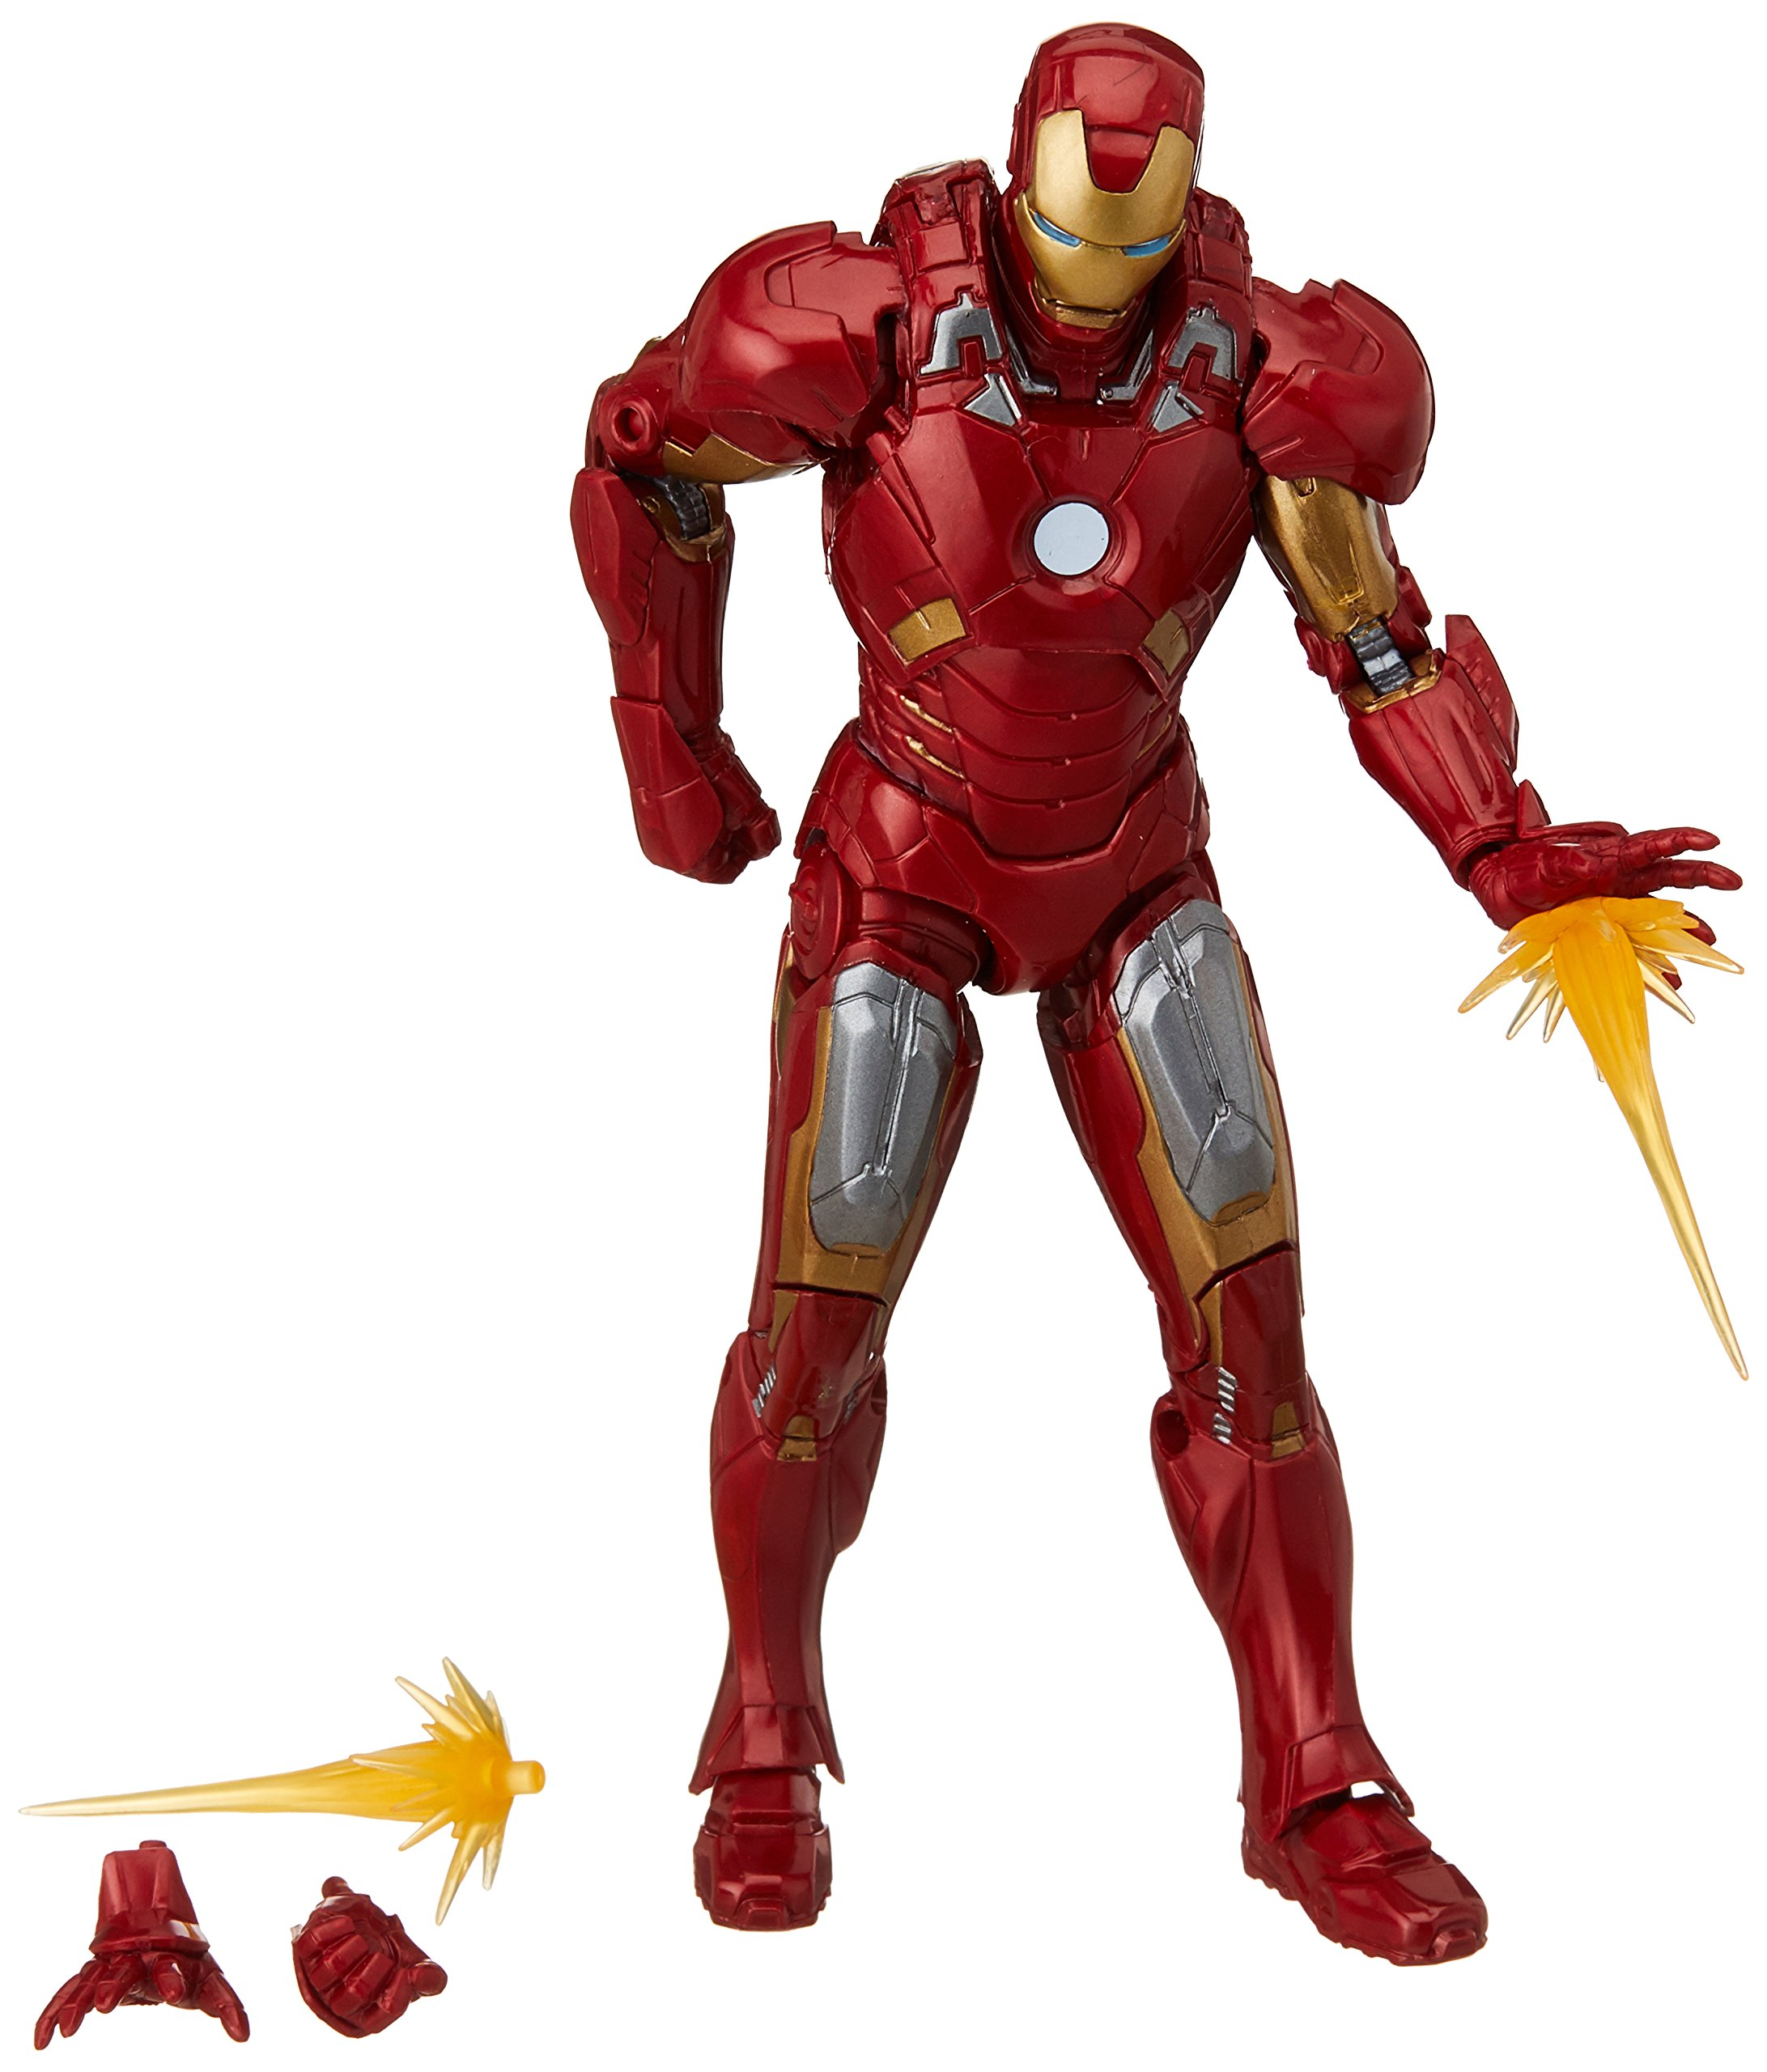 Marvel Studios: Marvel Studios: The First Ten Years The Avengers Iron Man